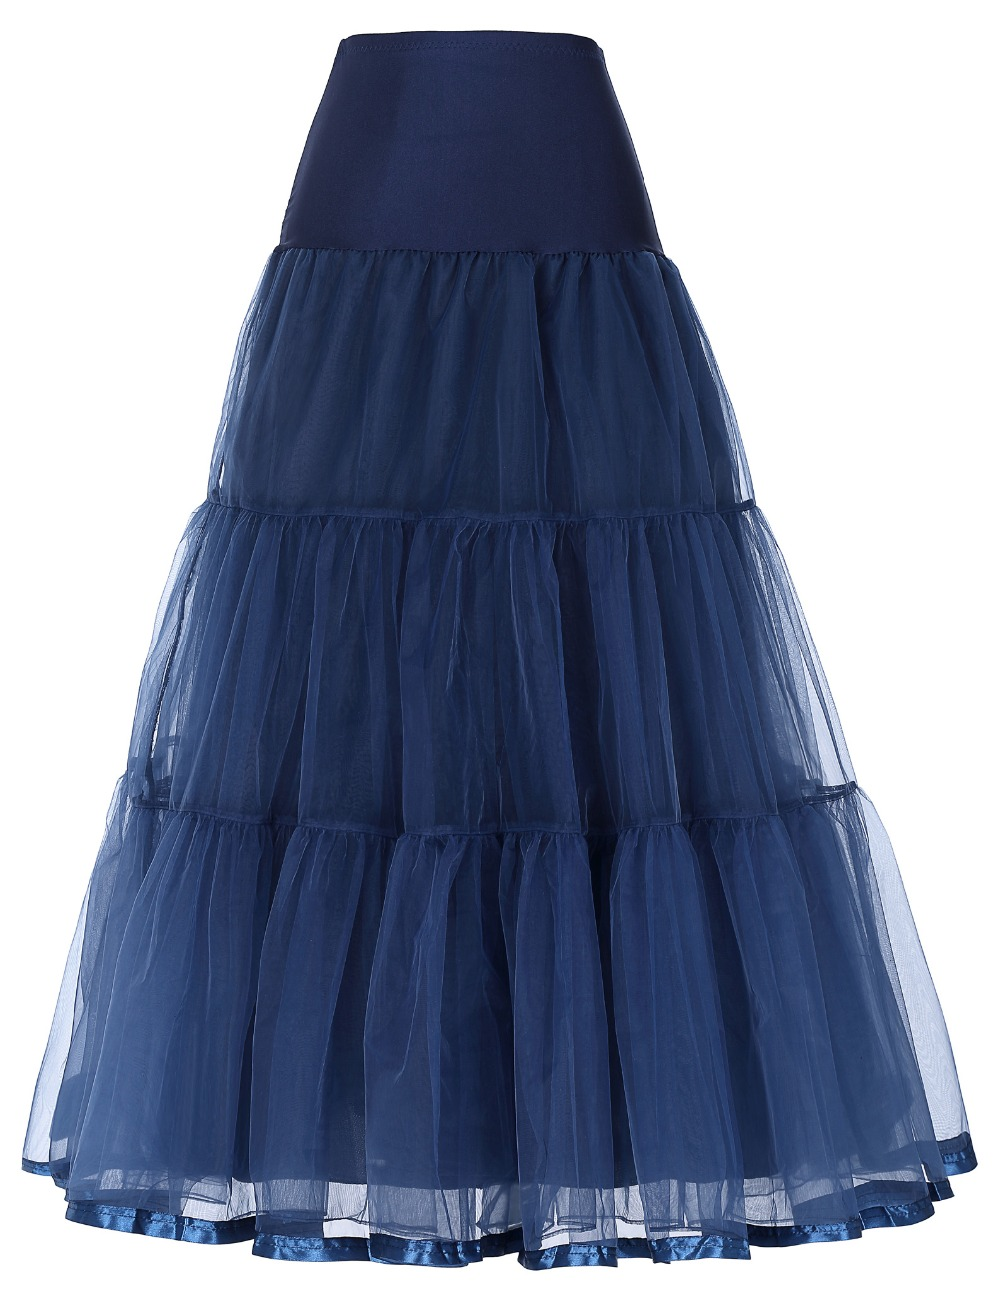 Beaut Shadow Store Tutu skirt navy blue silps swing rockabilly petticoat underskirt crinoline retro skirt petticoat underskirt for wedding bridal